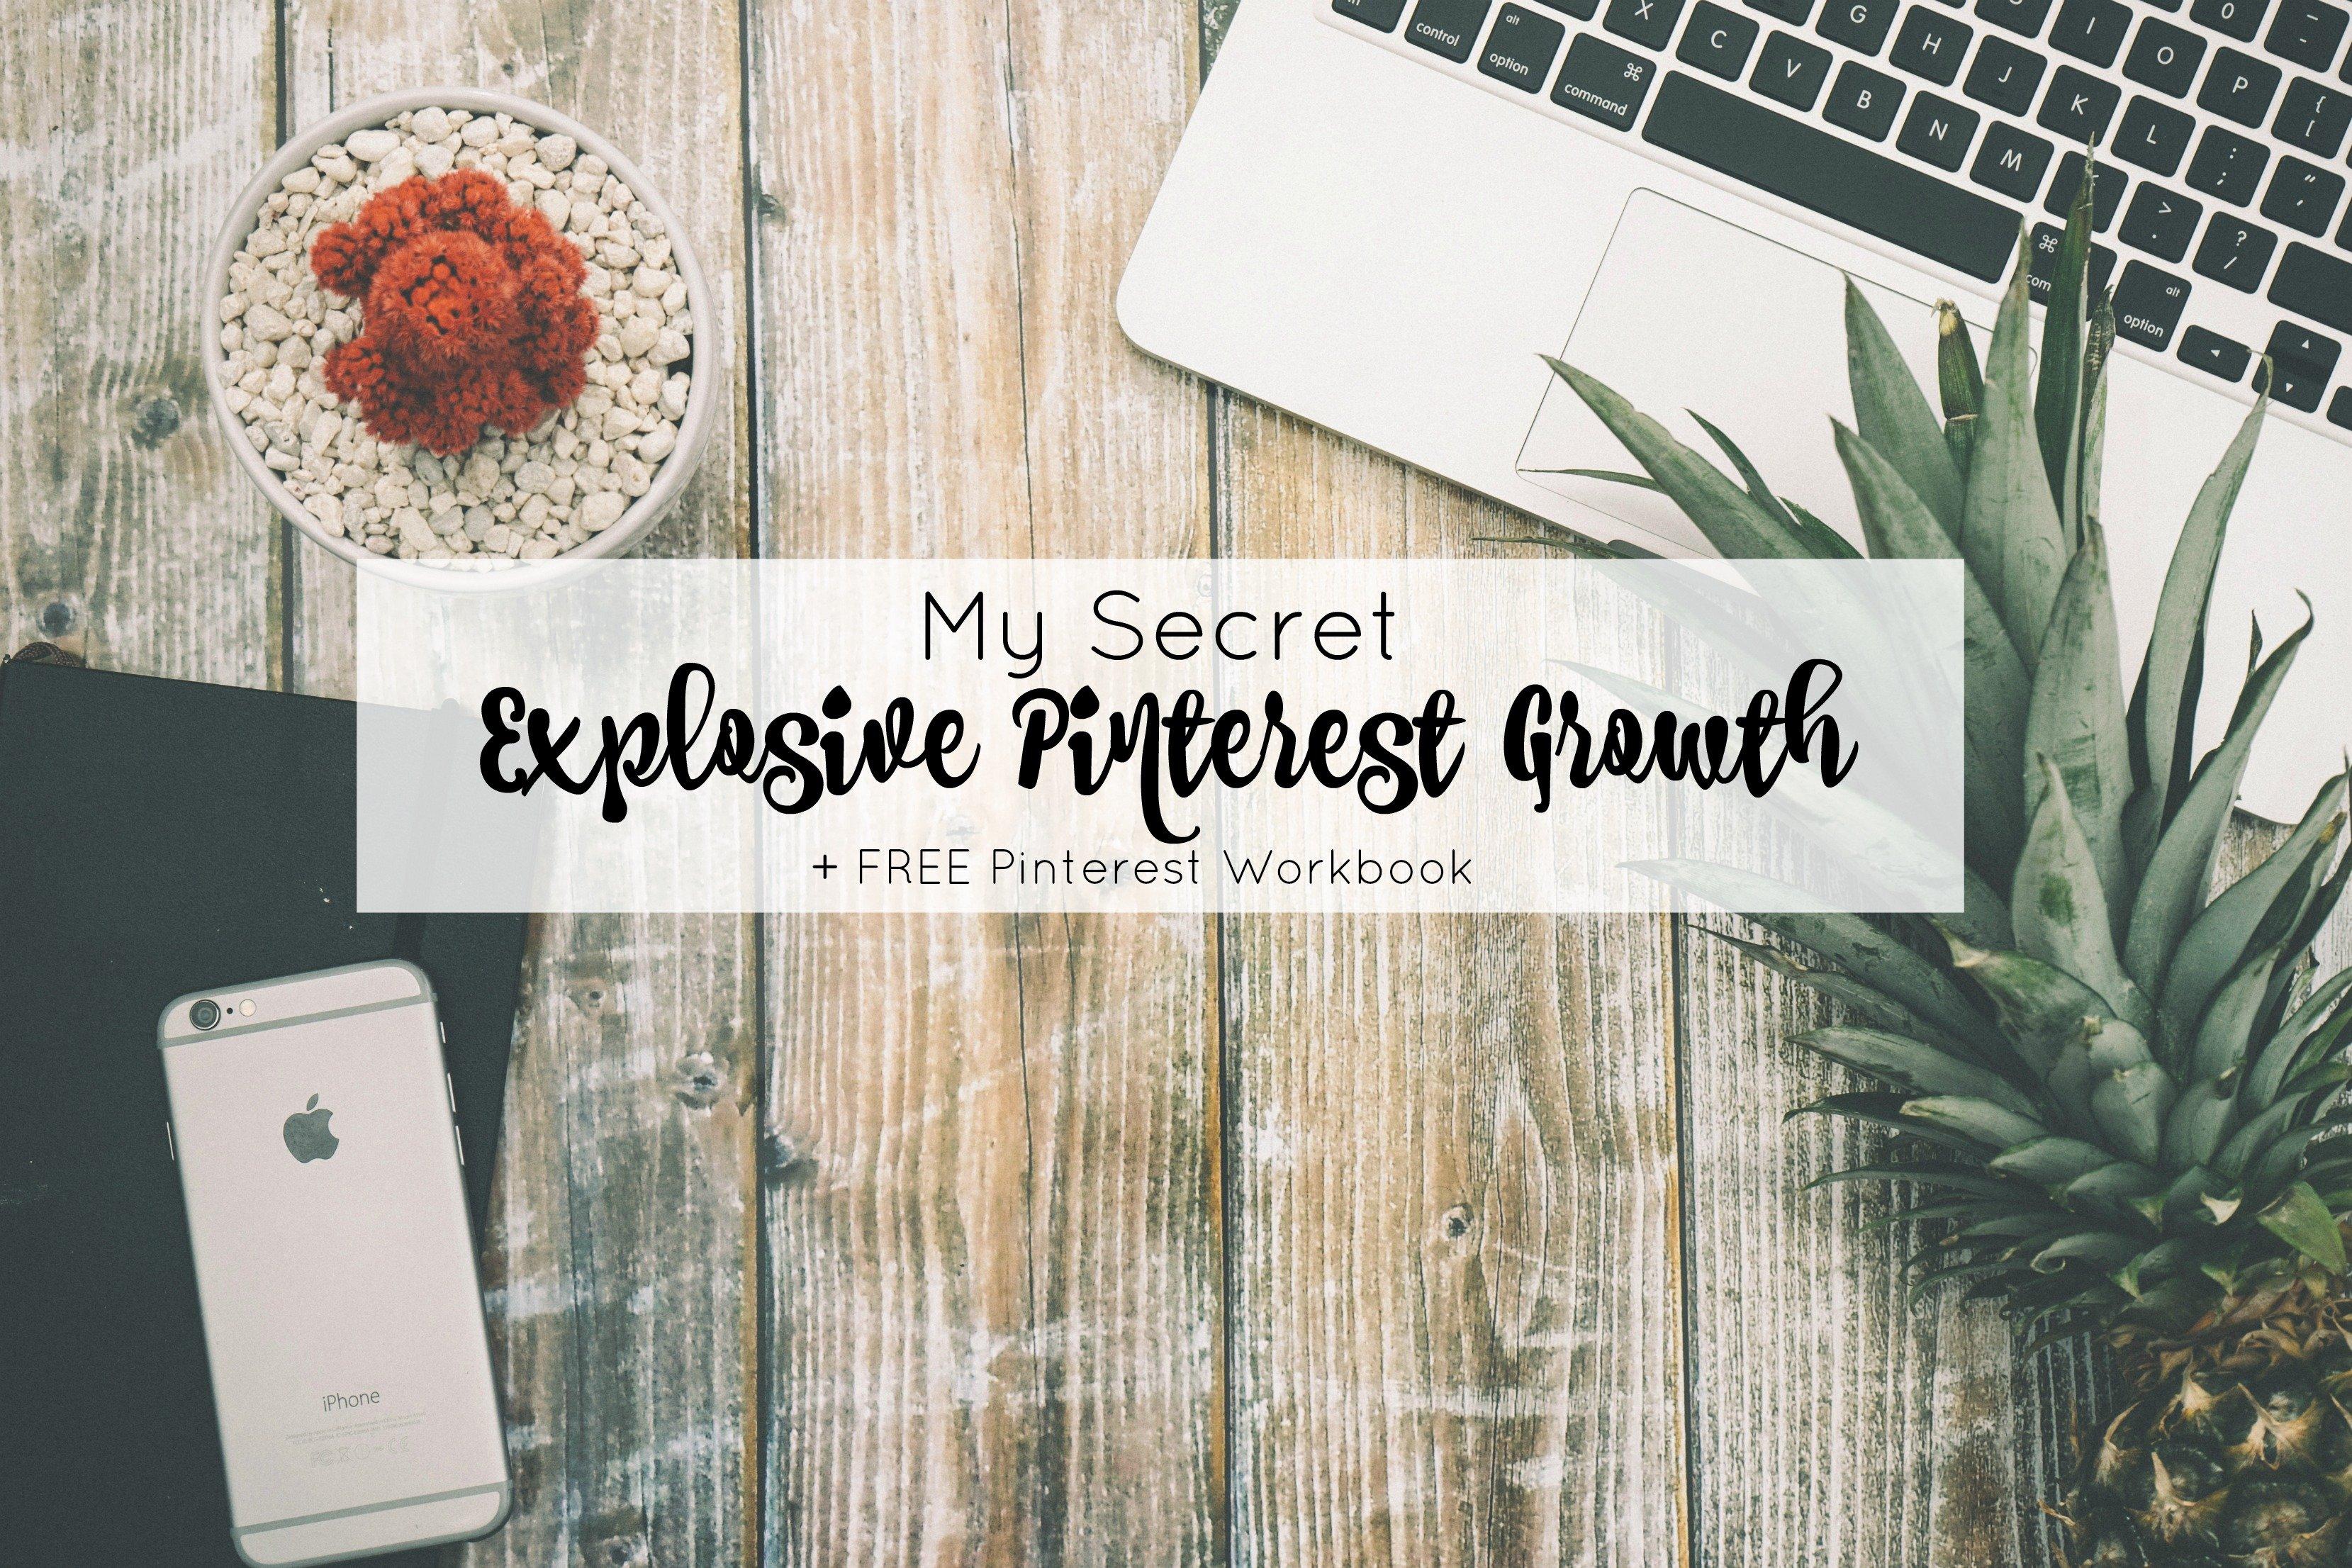 My Secret to Explosive Pinterest Growth